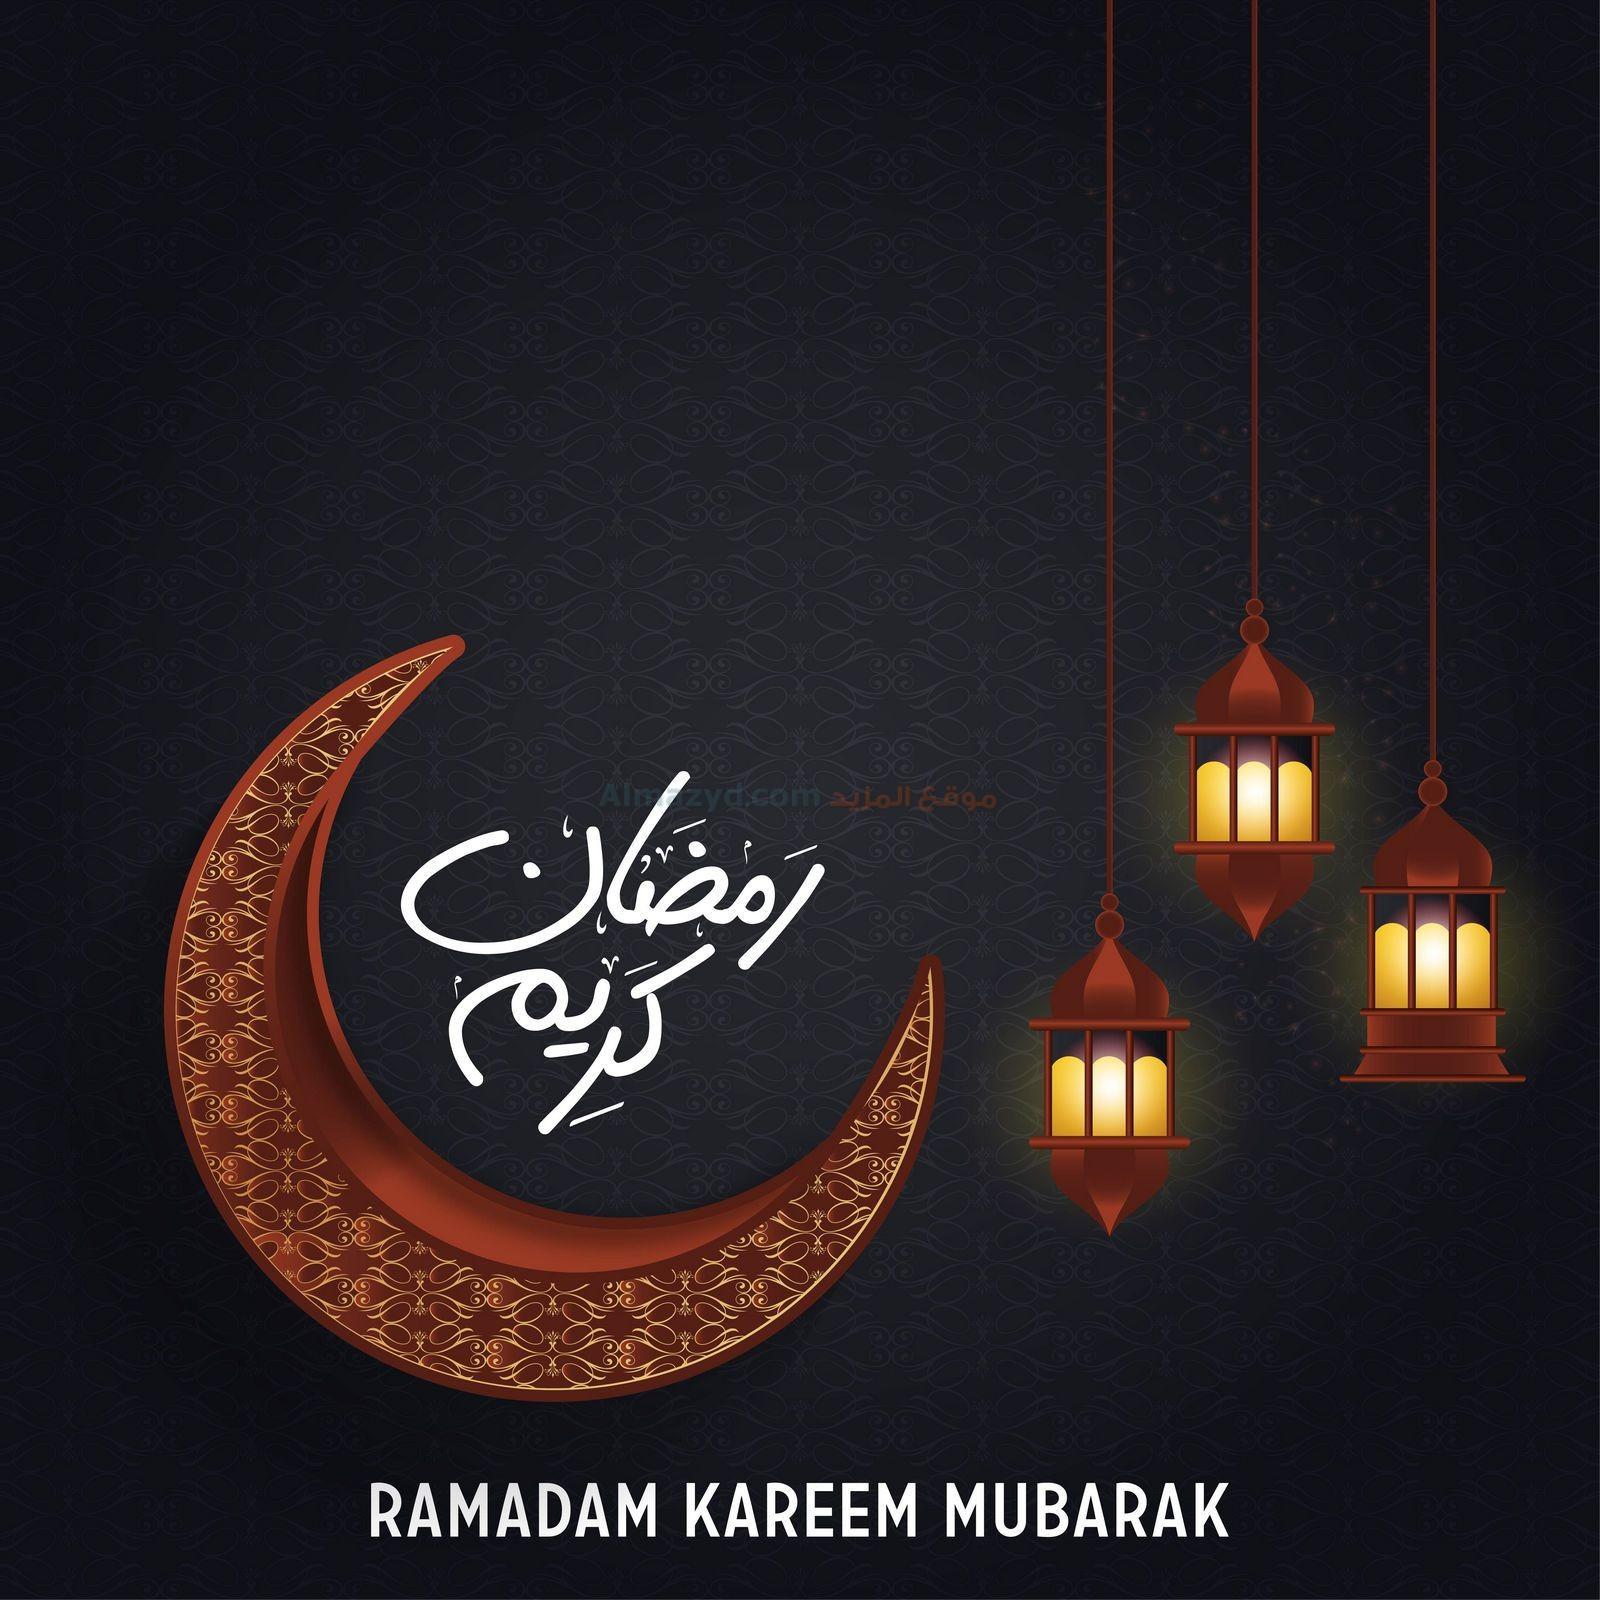 صور رمضان 2020 أجمل صور فوانيس رمضان 2021 بطاقات تهنئة لرمضان تهنئة رمضان بالأسماء 13